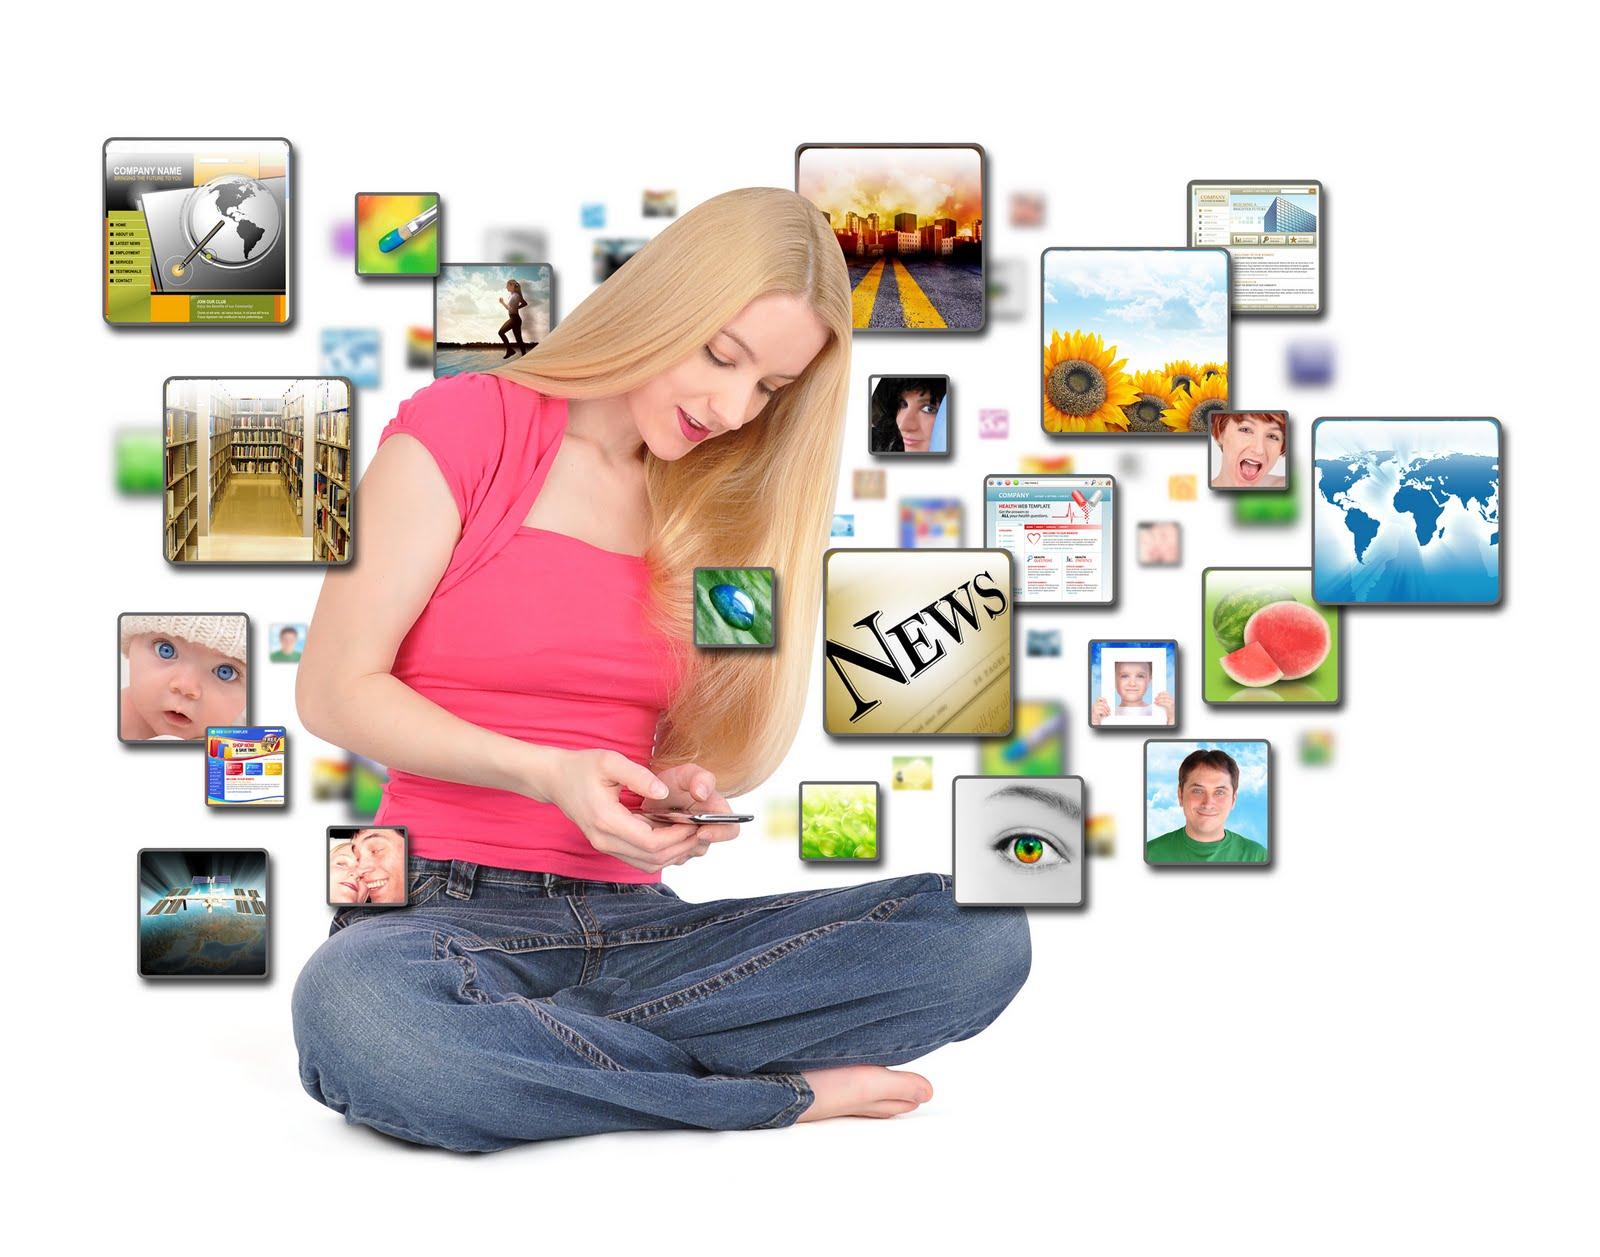 Integrating transmedia storytelling with mobile app